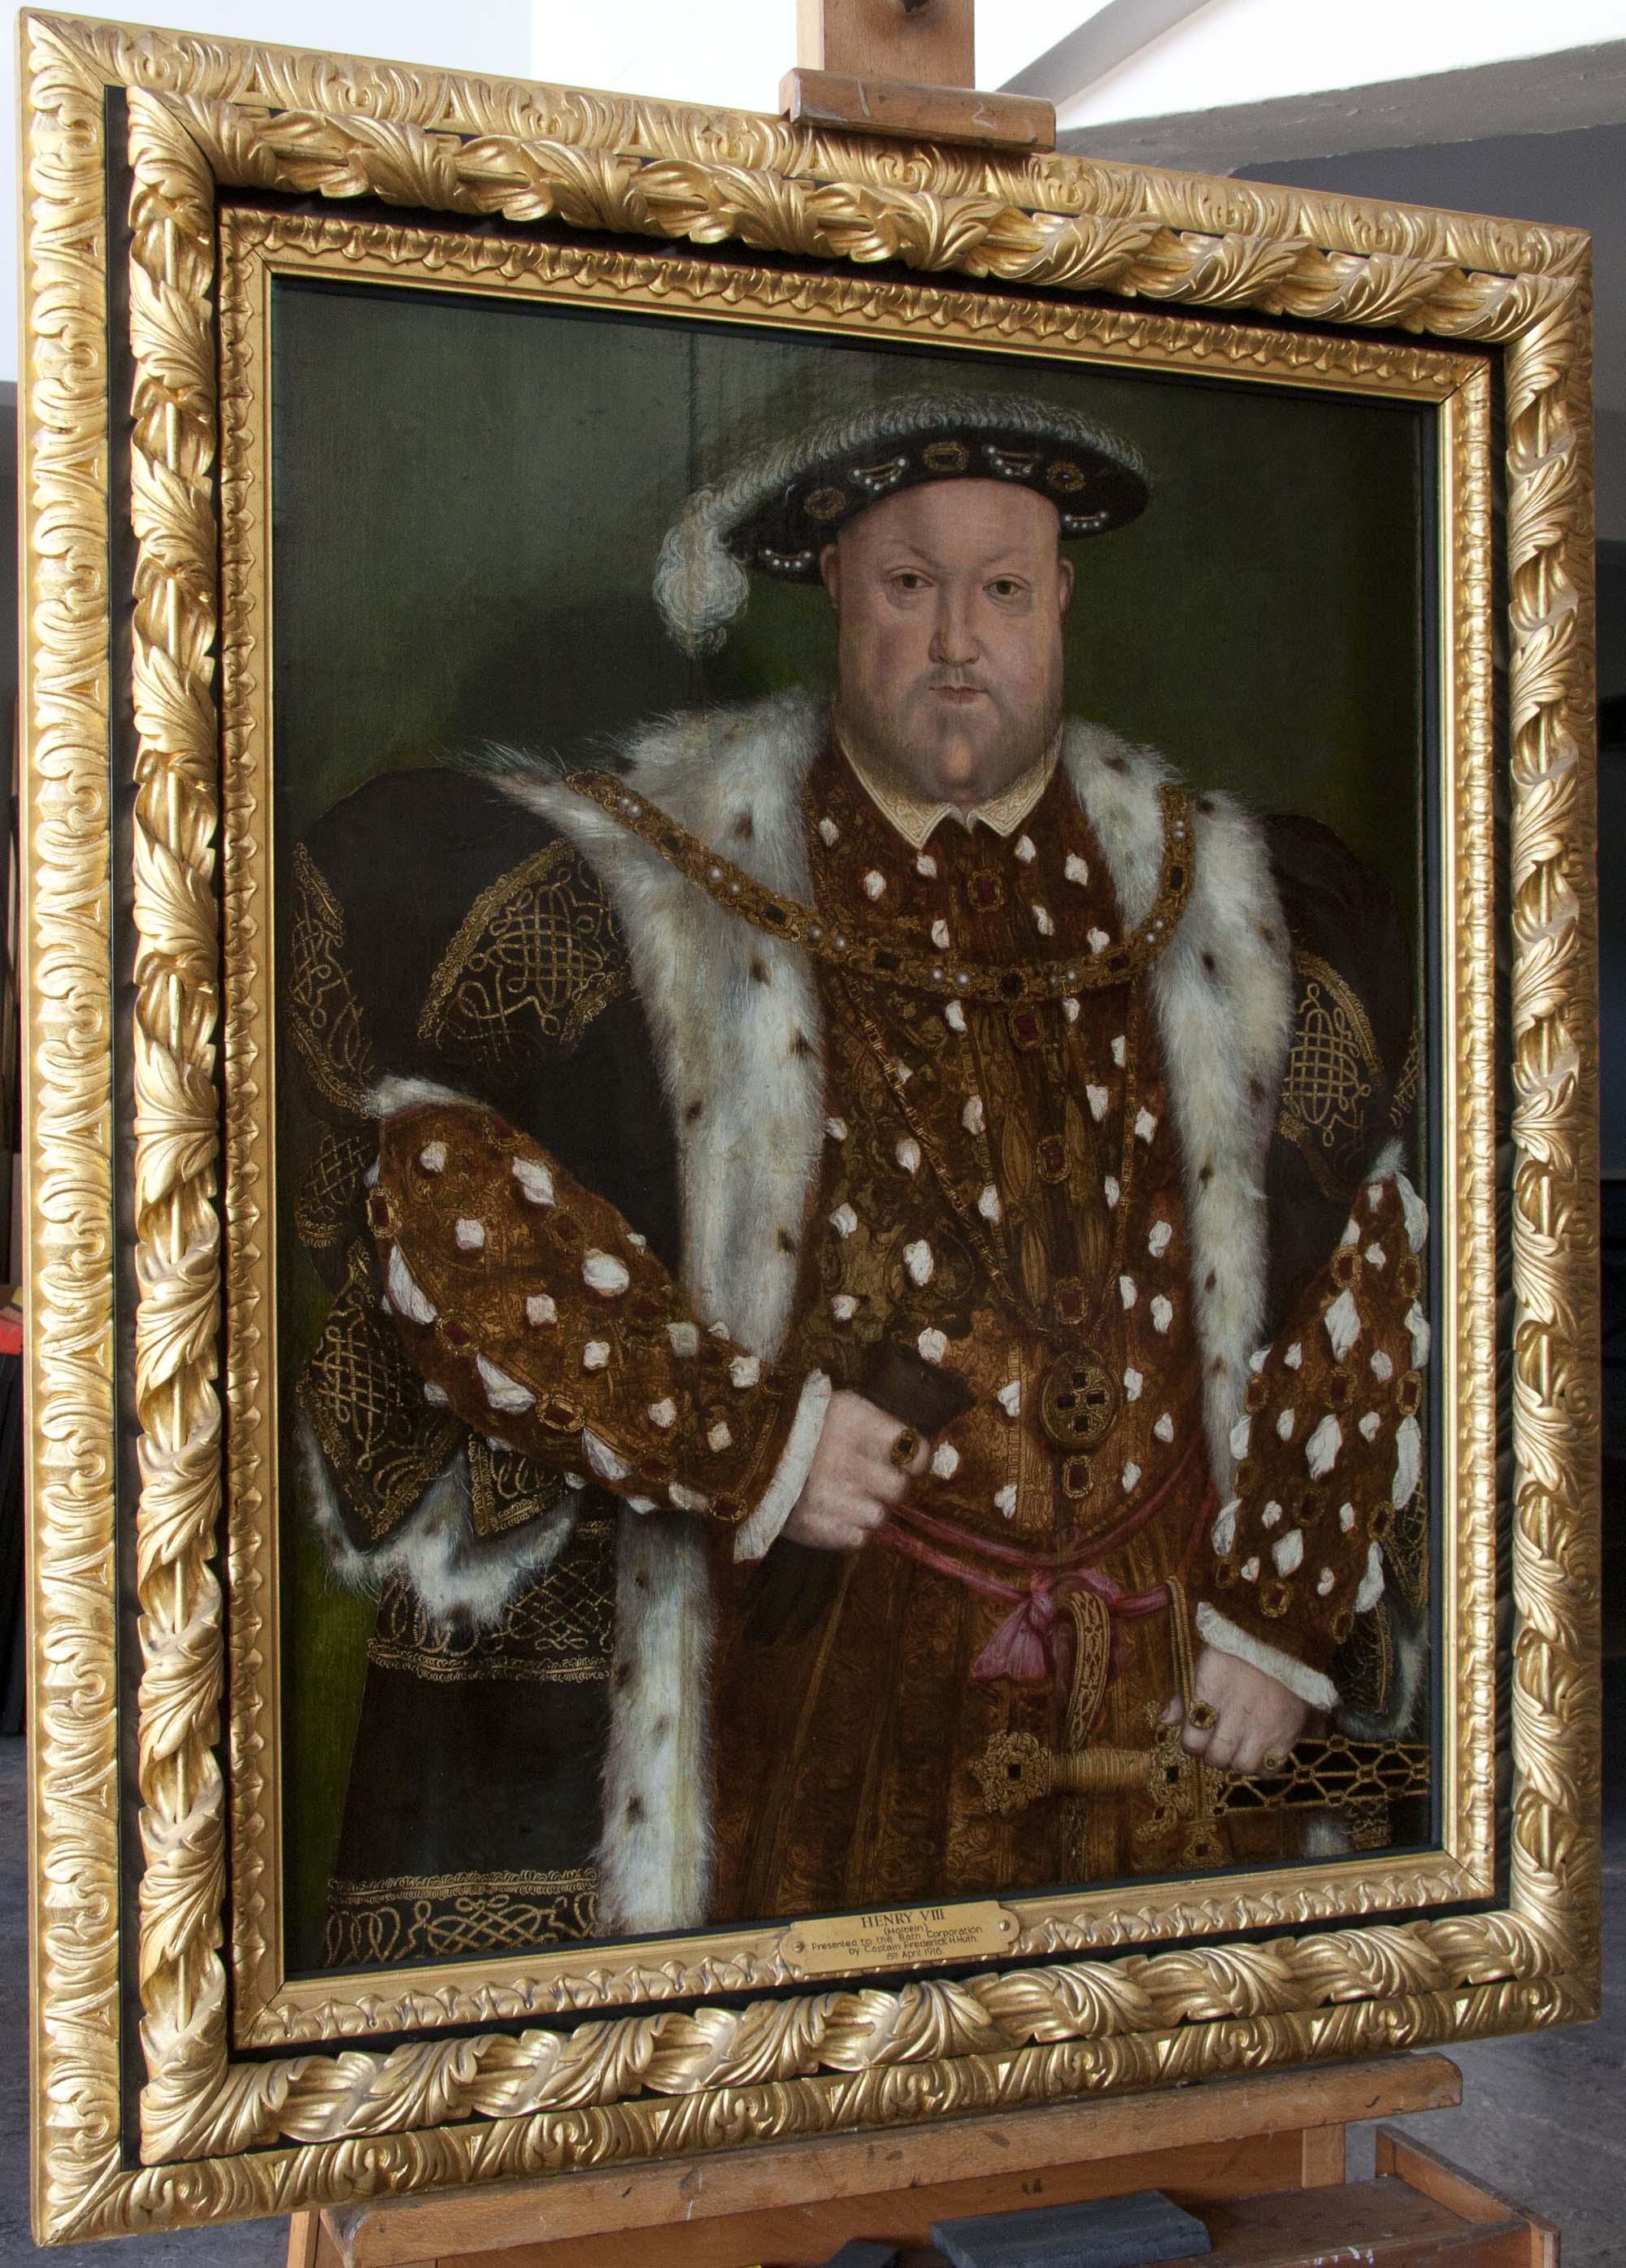 a photo of a gilt framed portrait of Henry VIII